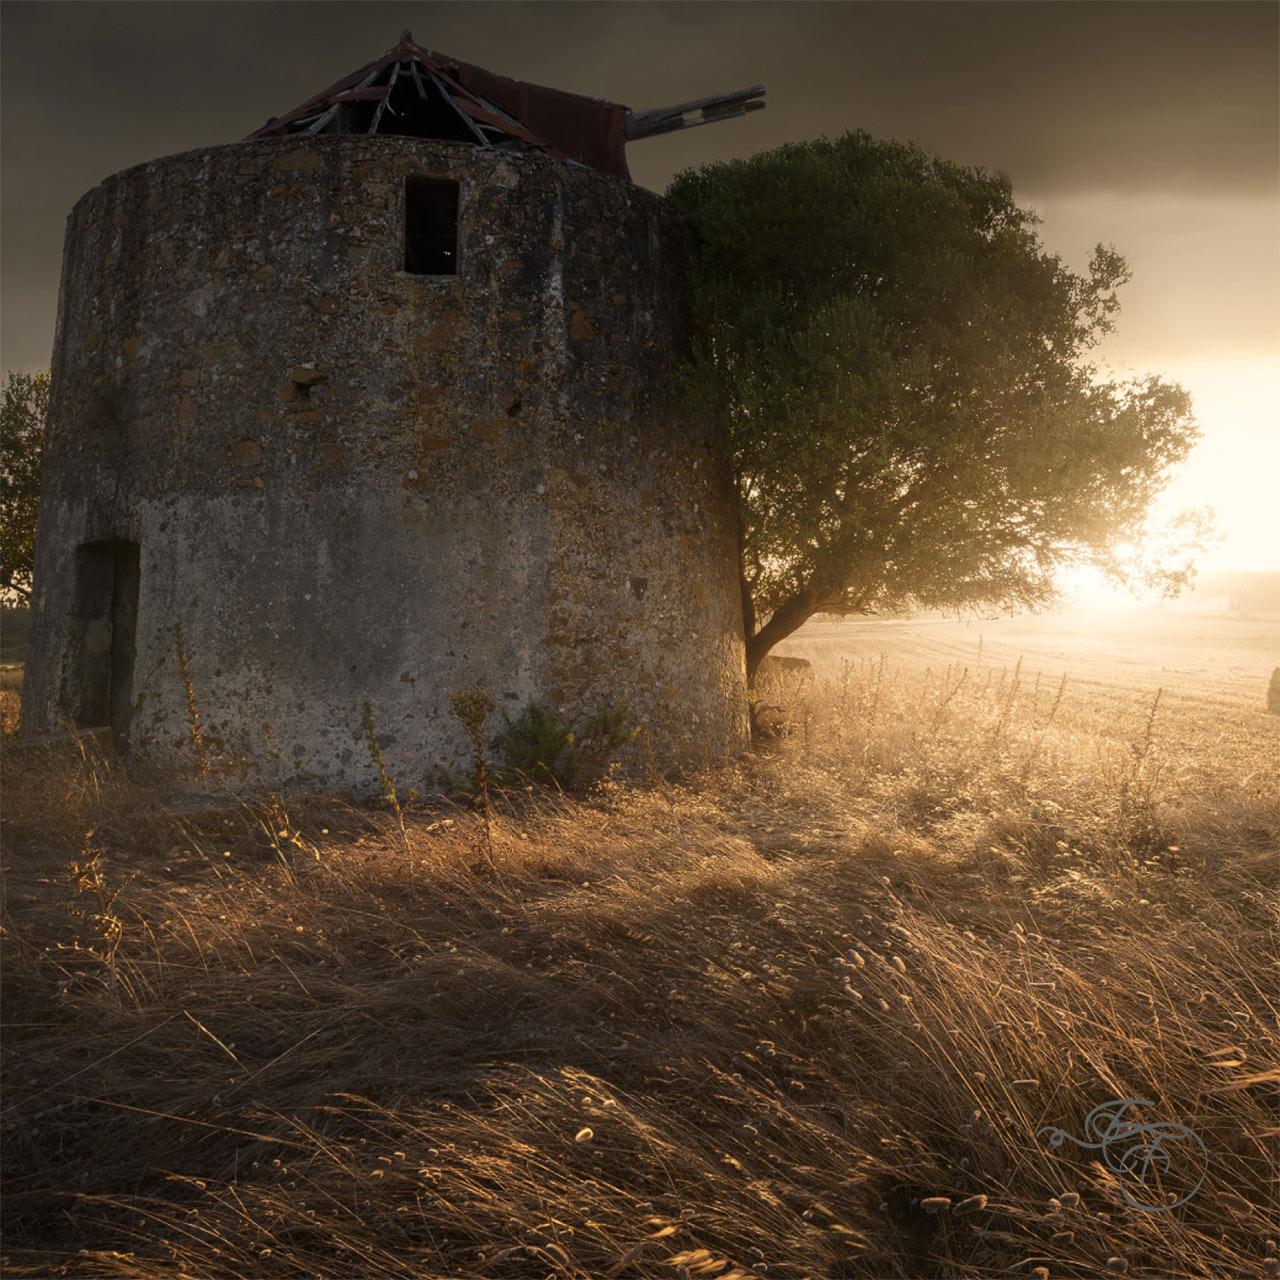 enrico-fossati-photography-nature